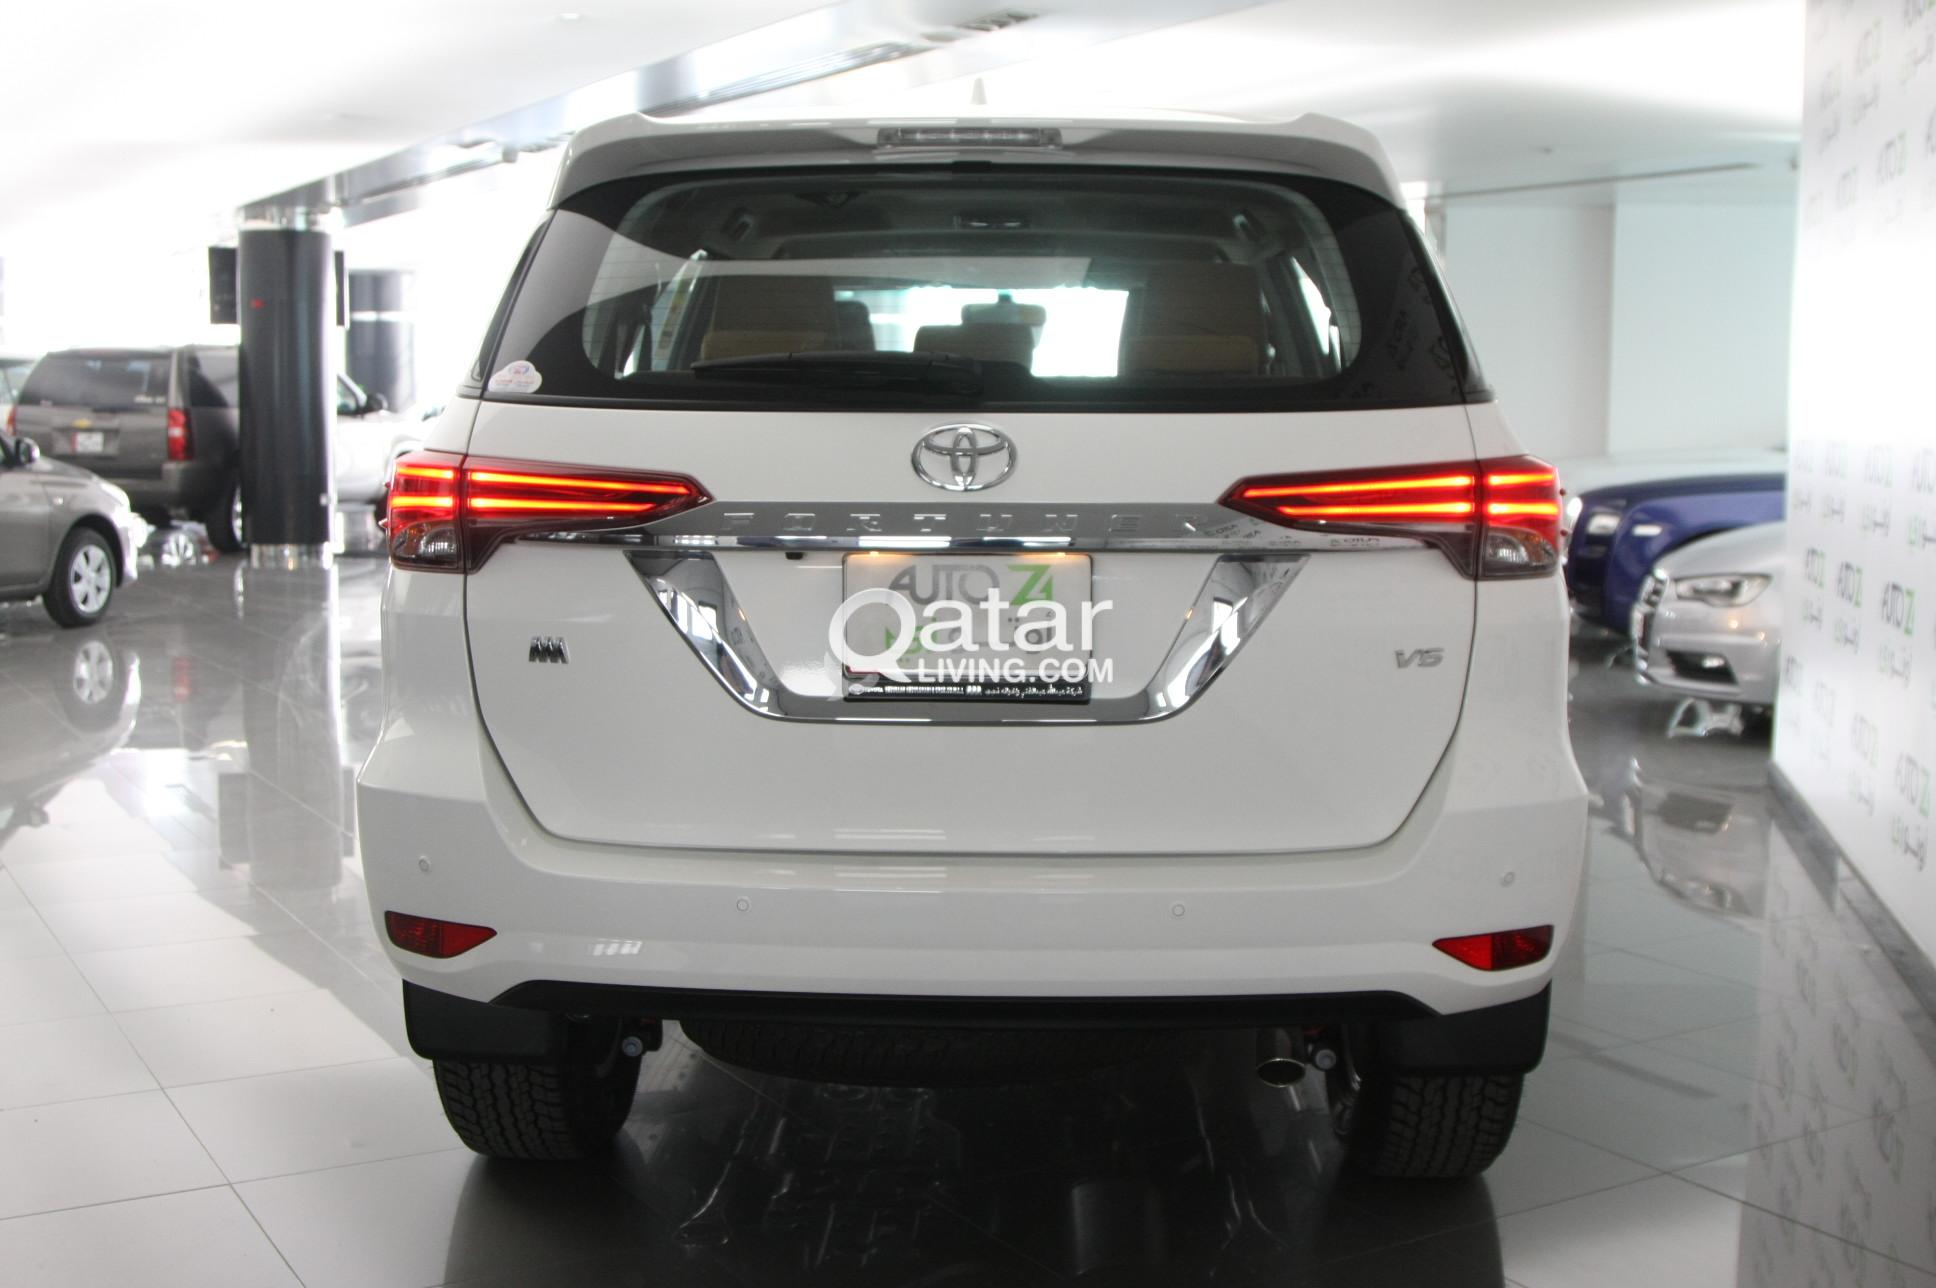 Toyota Fortuner 2018 Qatar Living